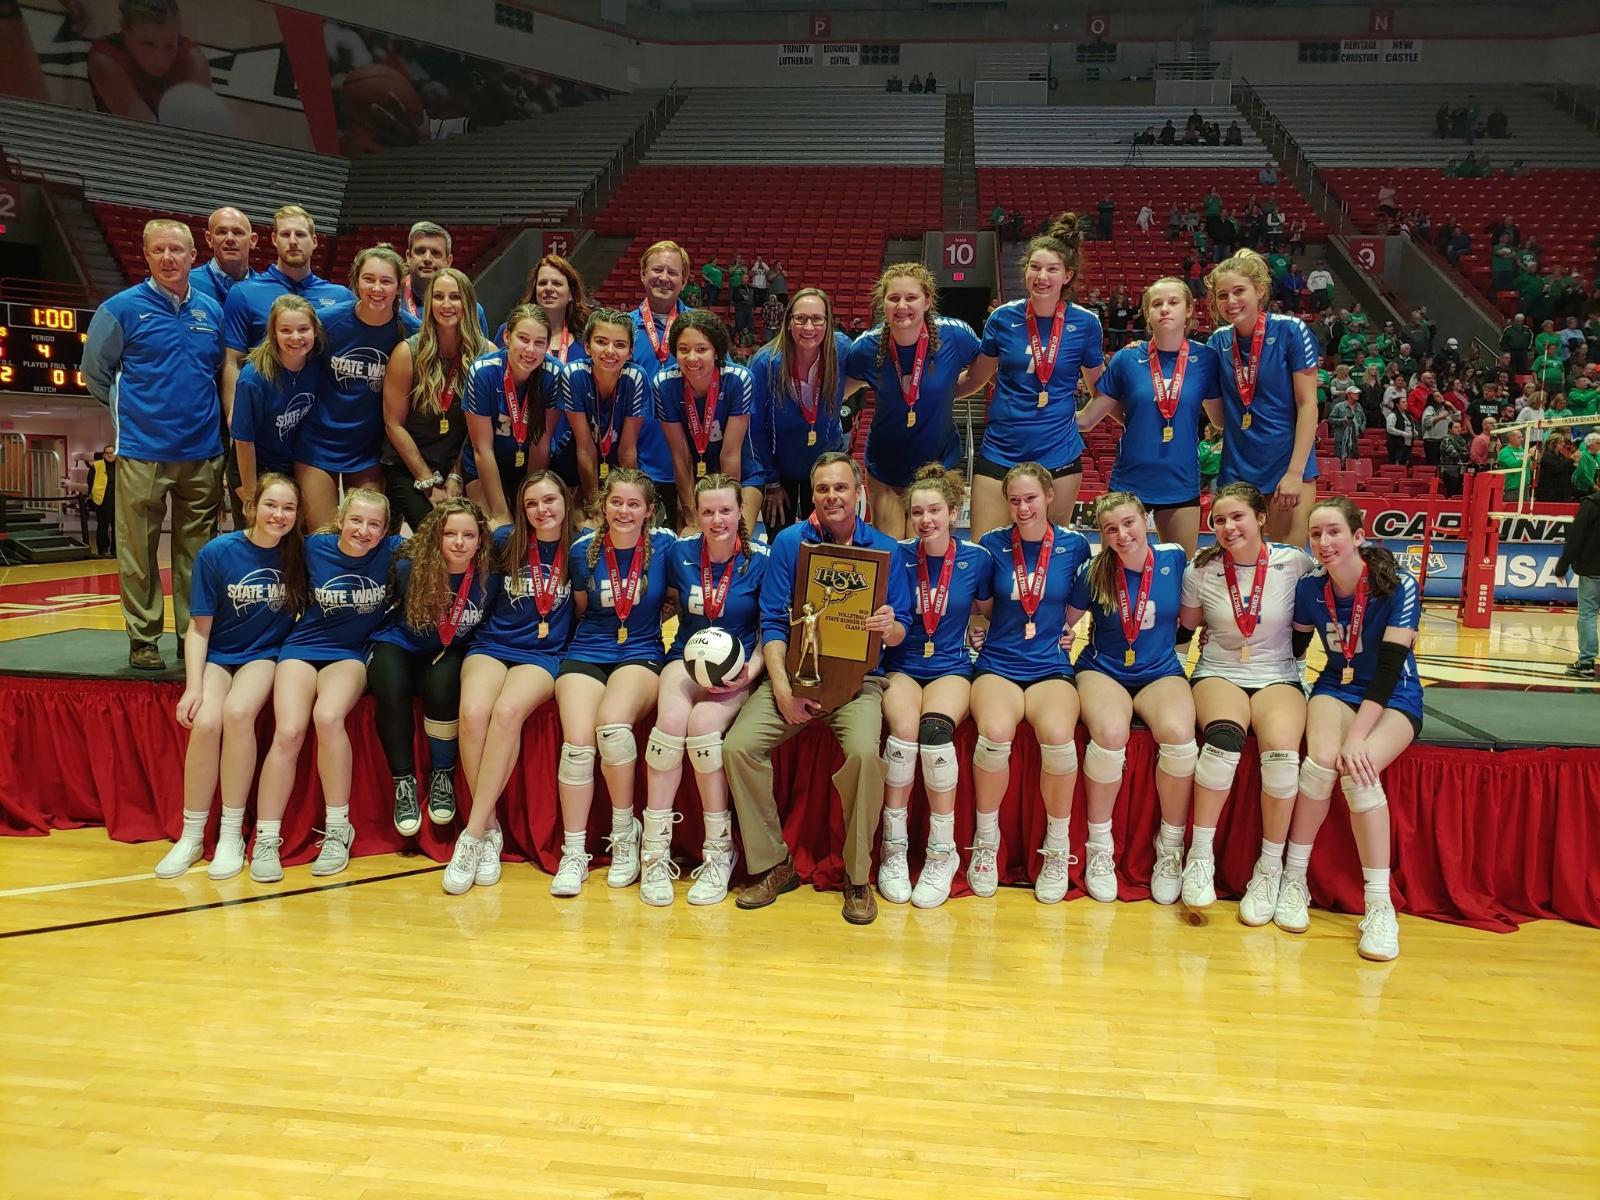 Congratulations Hamilton Southeastern Volleyball – 2019 State Runner-up